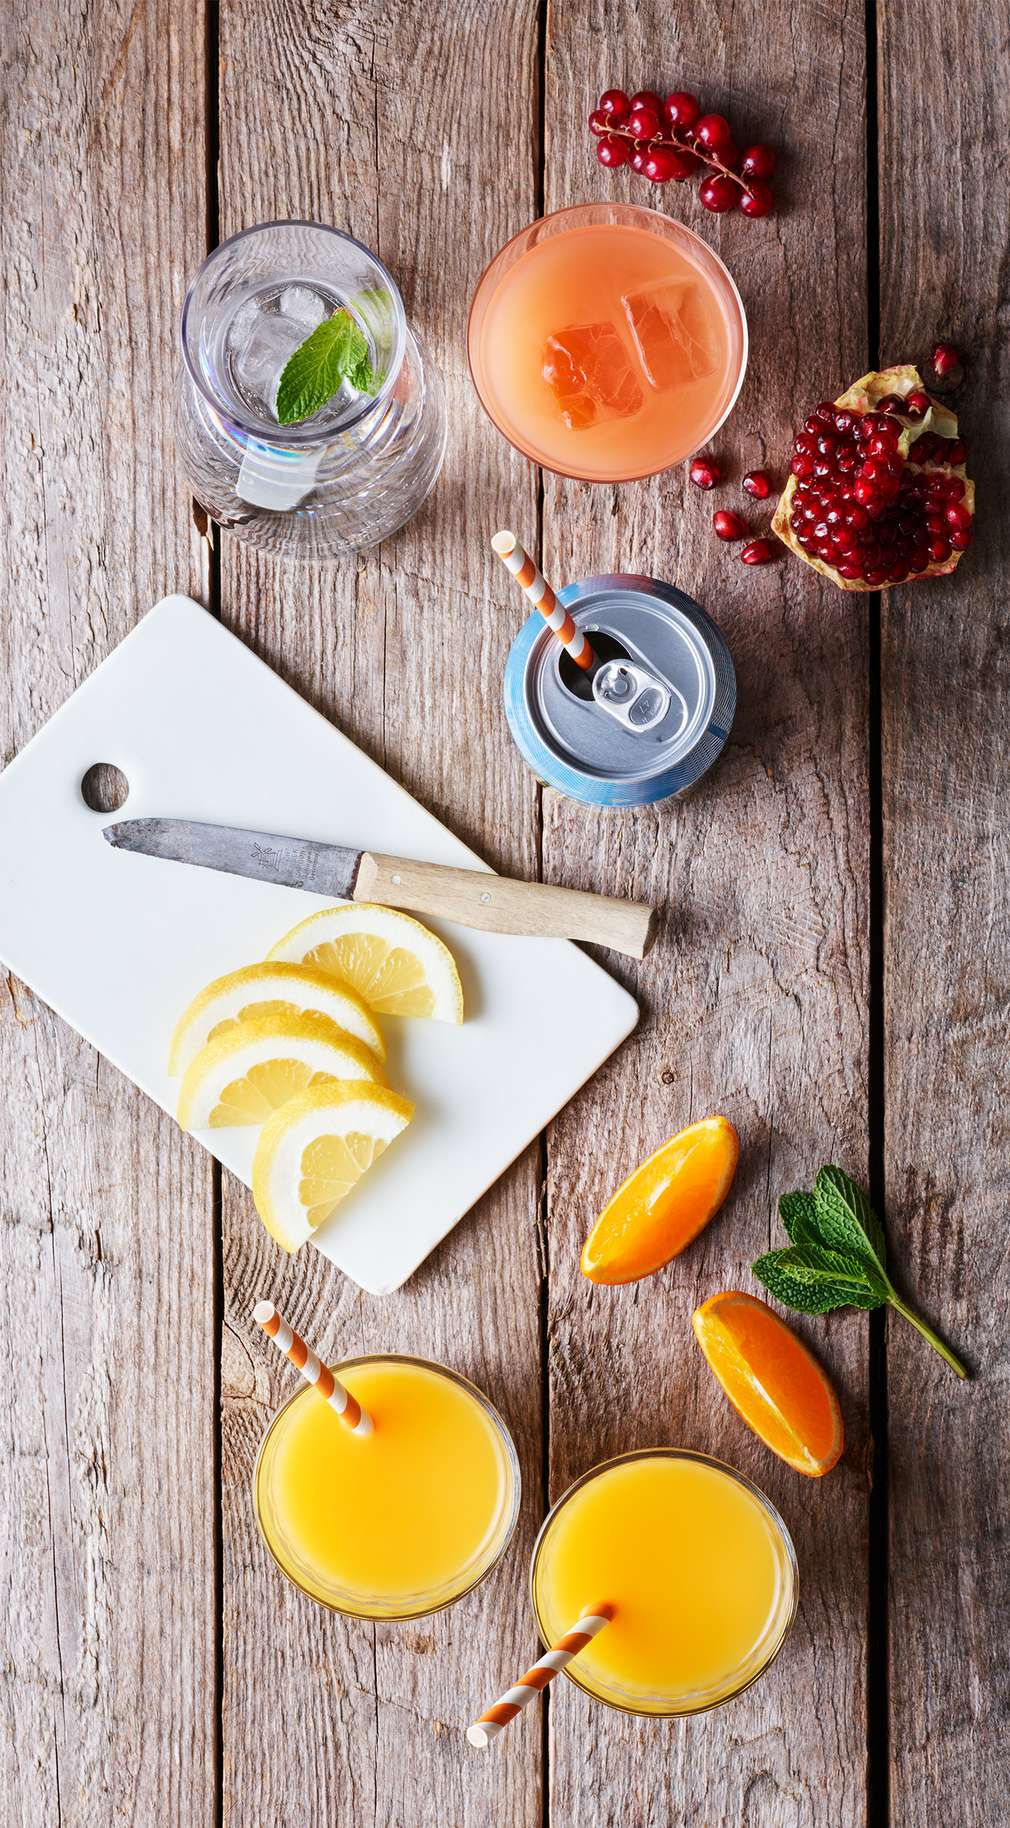 Изображение на свежи плодови напитки